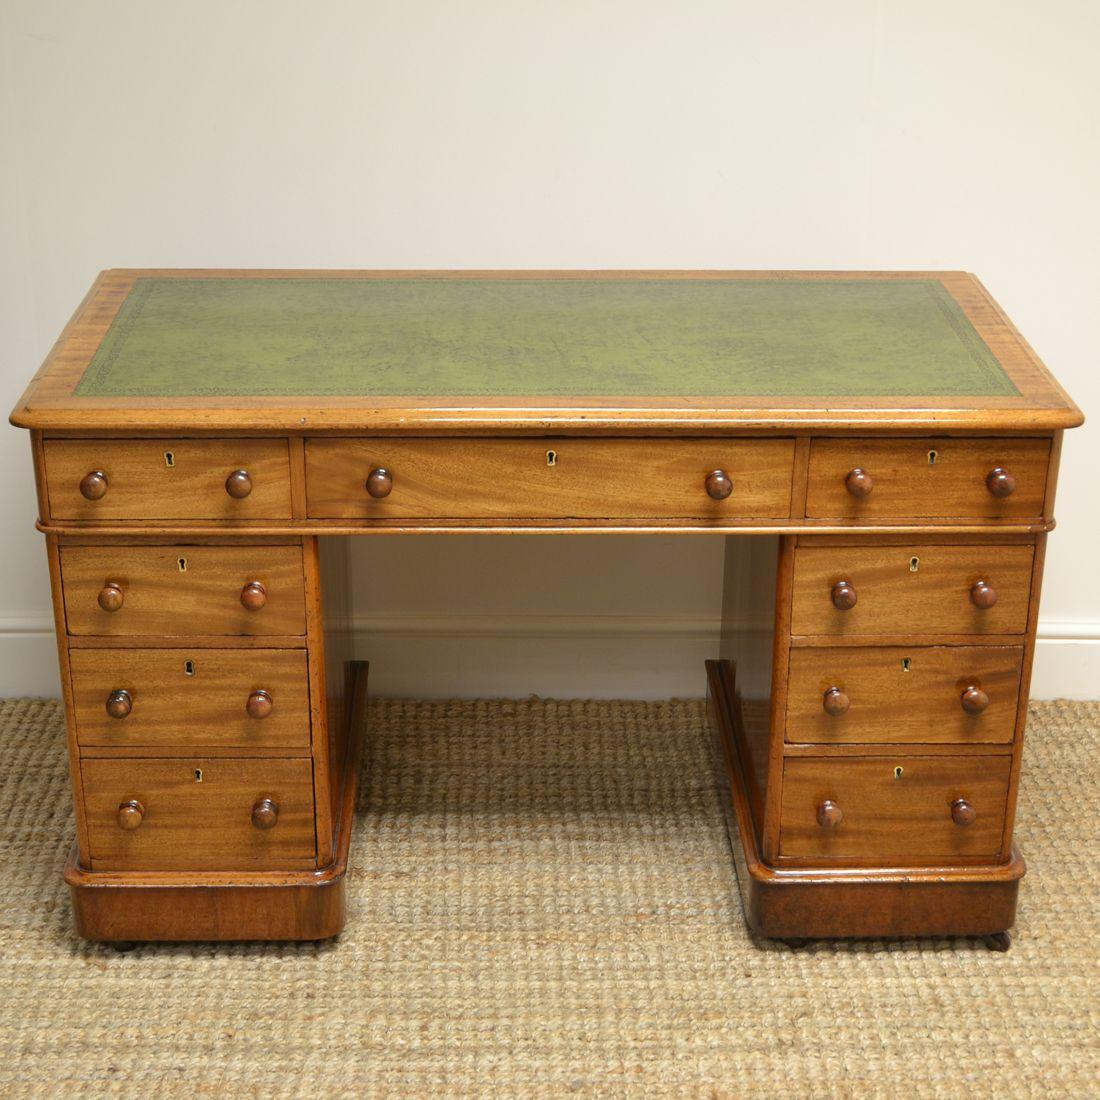 Quality Victorian Mahogany Antique Pedestal Knee Hole Desk Antiques World In 2020 Antique Desk Desk Fine Antique Furniture